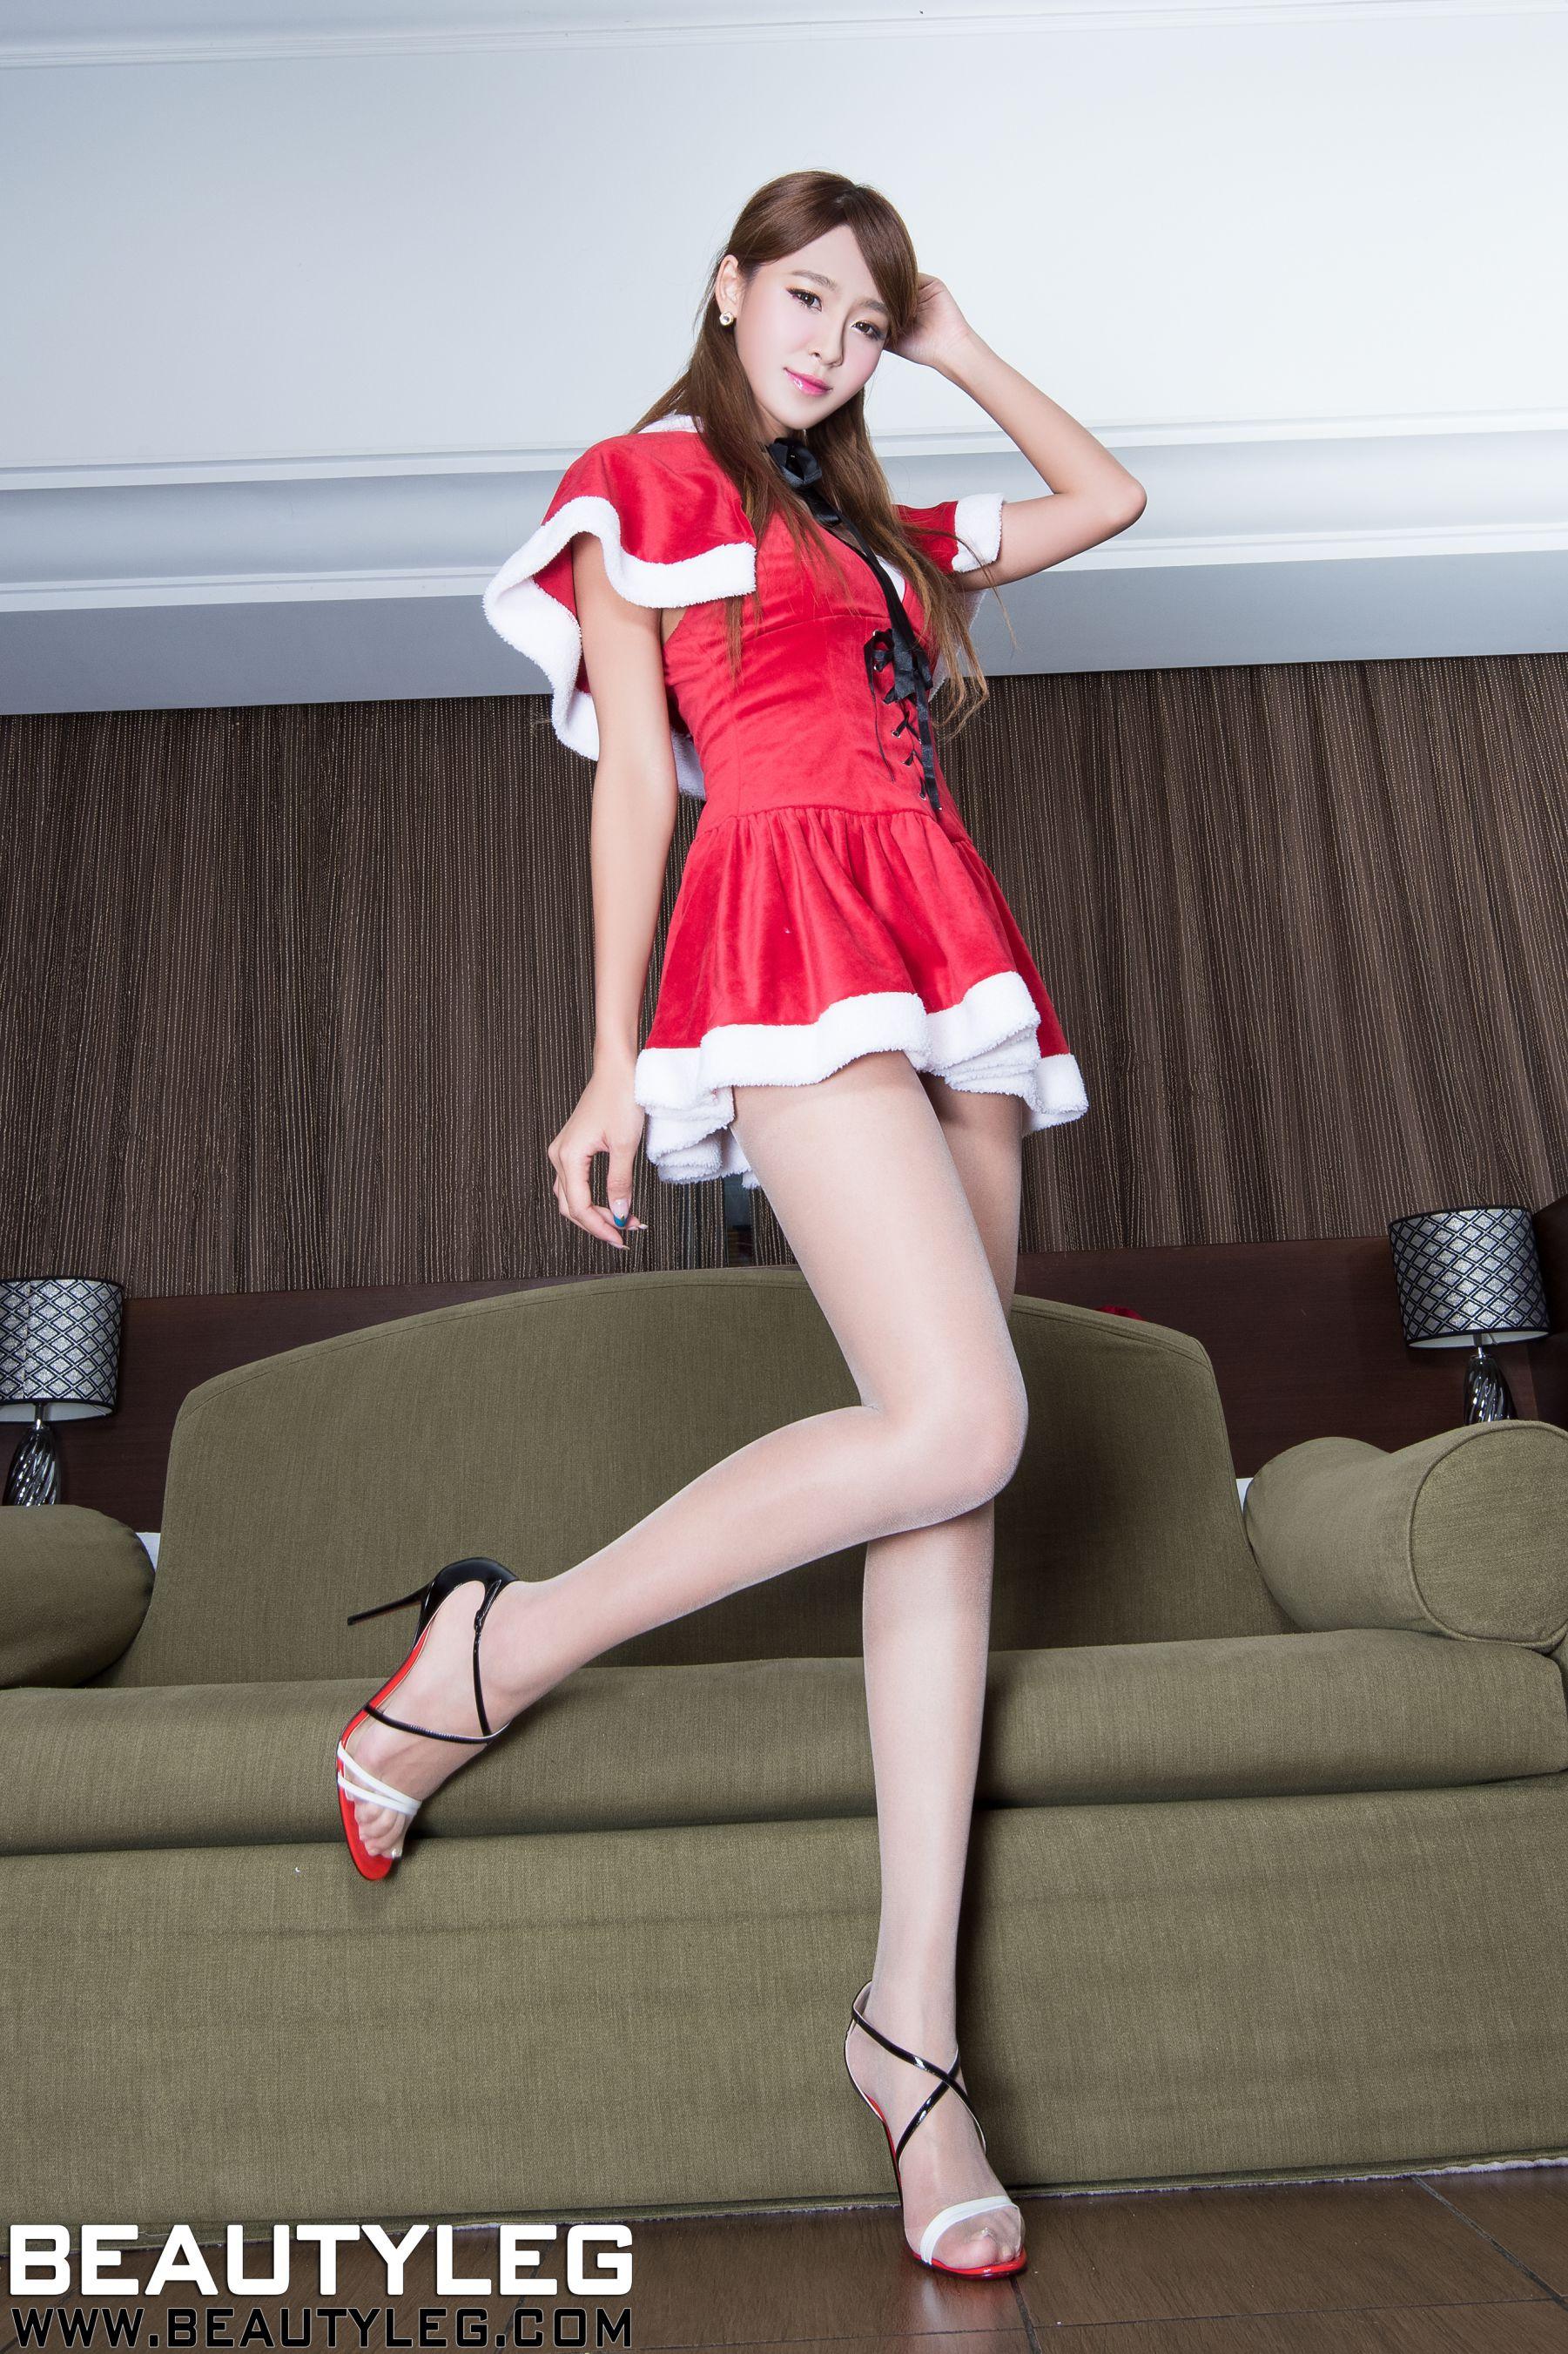 VOL.1295 [Beautyleg]美腿圣诞:Winnie小雪(庄咏惠,庄温妮,腿模Winnie)高品质写真套图(19P)